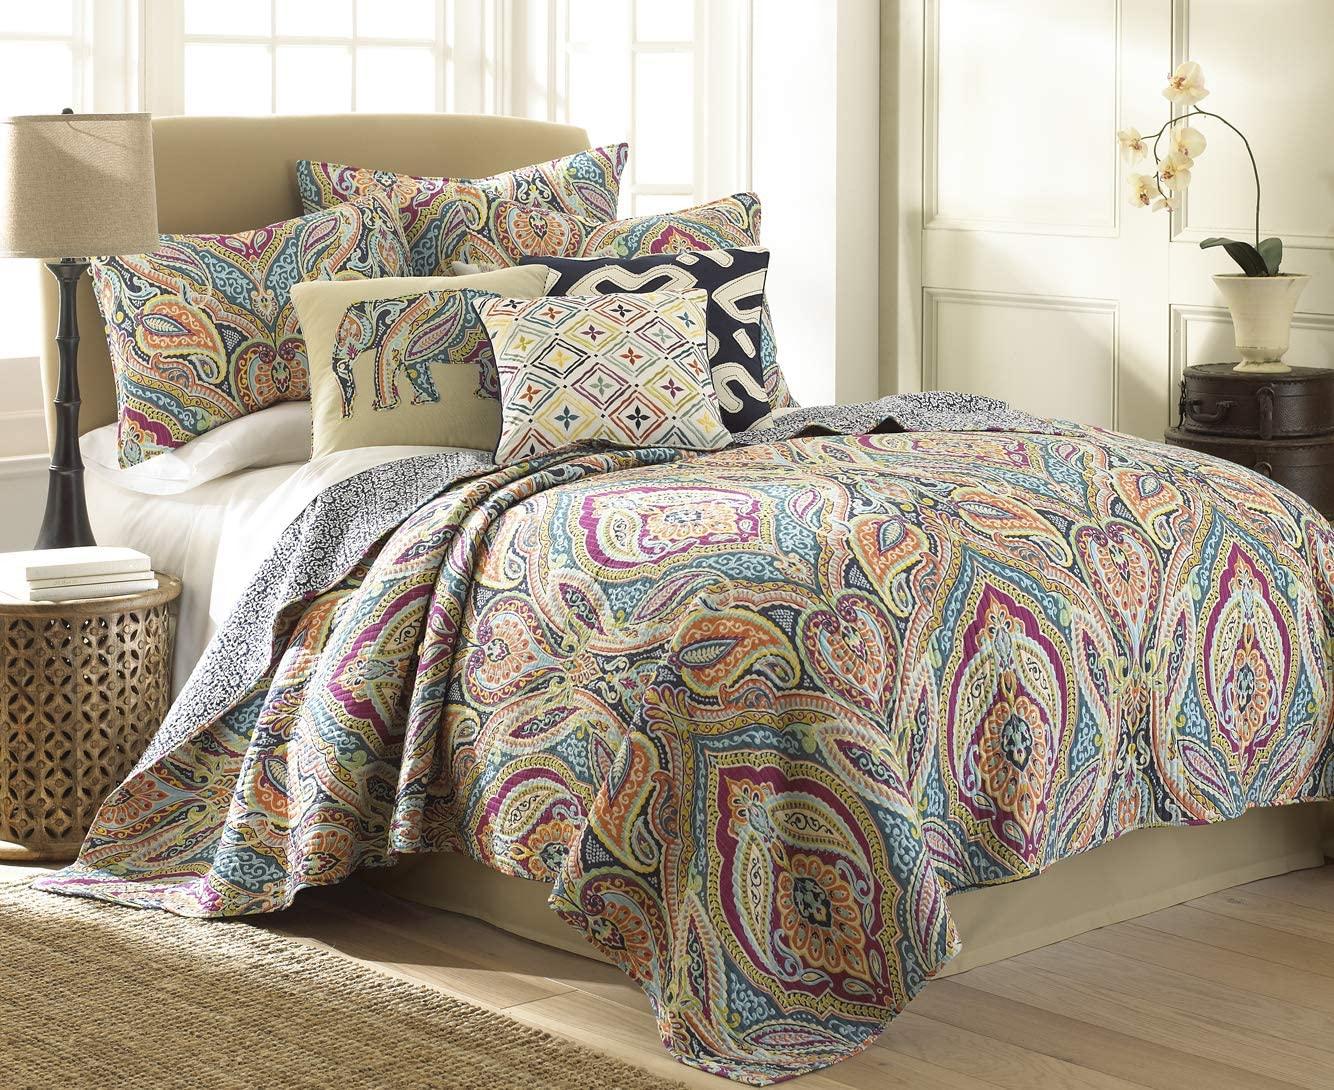 Levtex Home Magnolia Navy Full/Qeen Set, Paisley, 100% Cotton, Navi, Multi